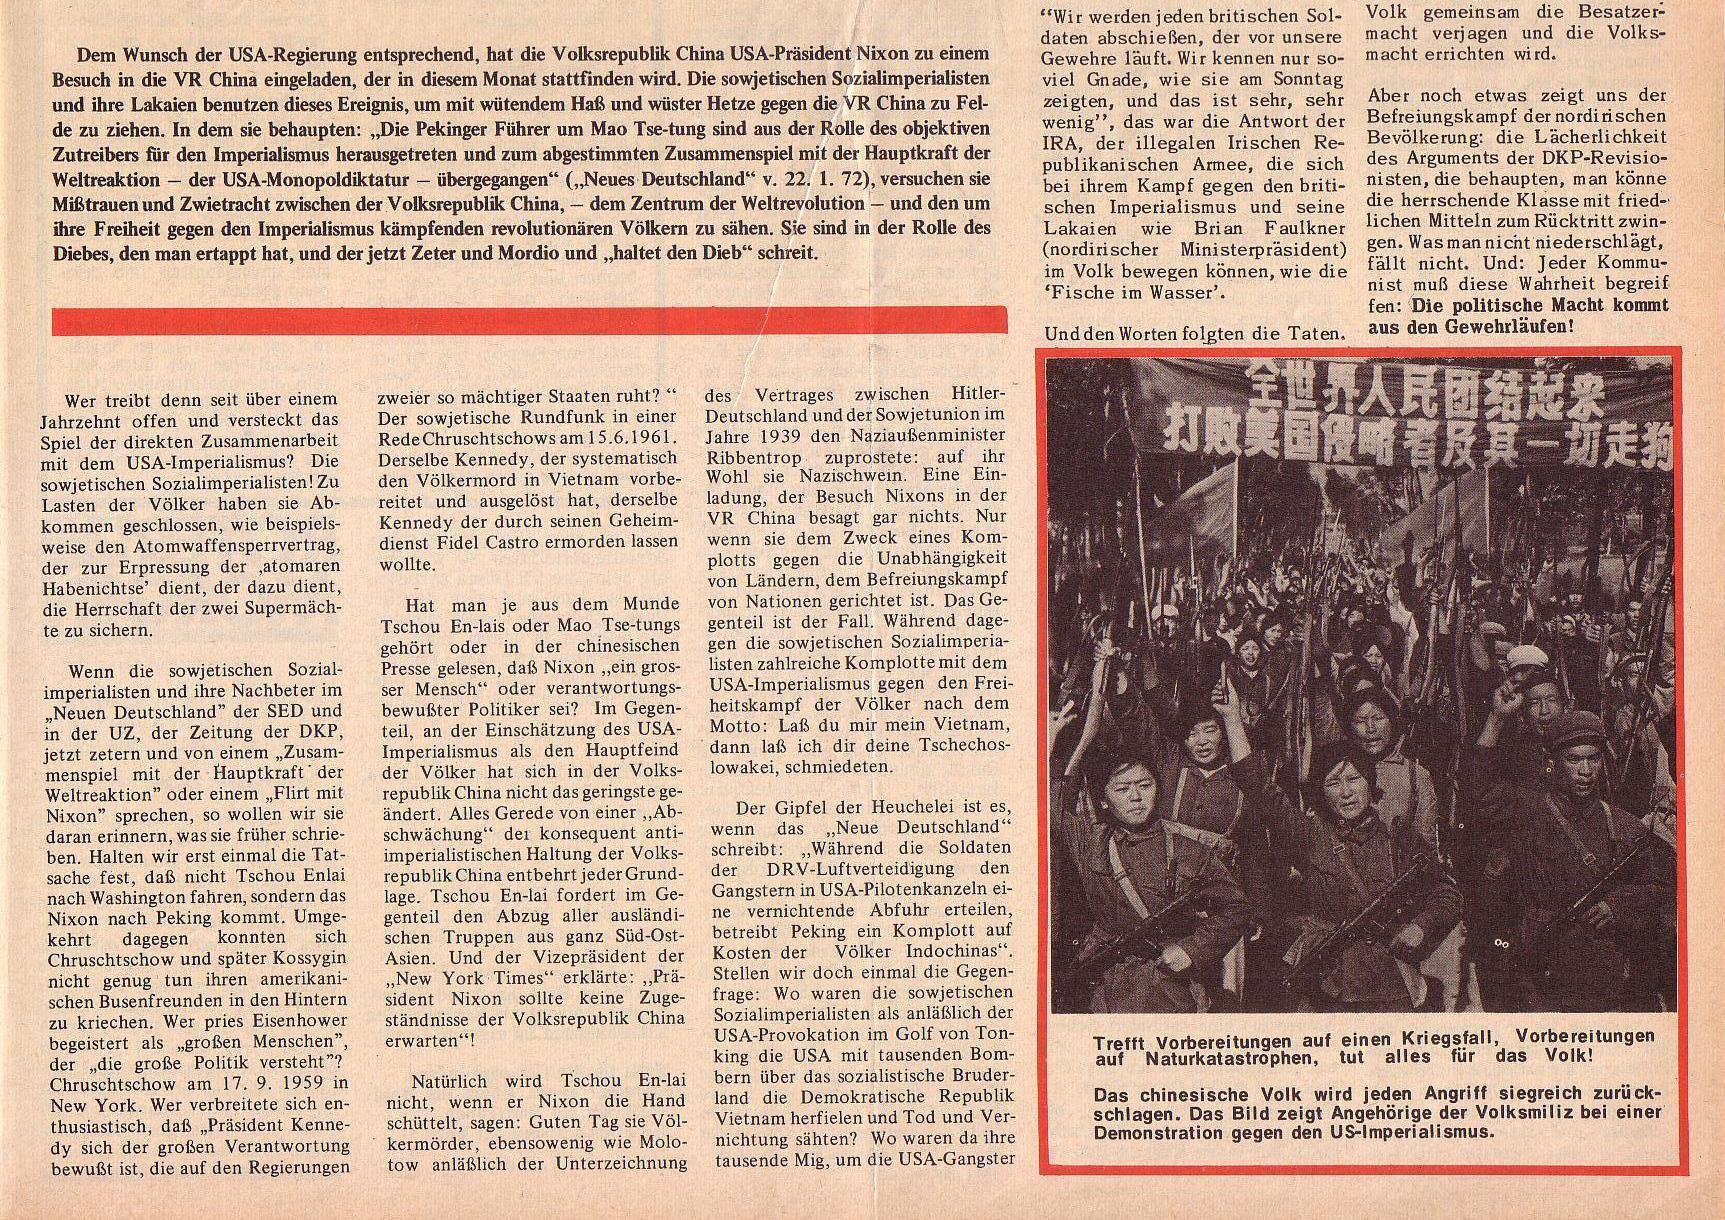 Roter Morgen, 6. Jg., 14. Februar 1972, Nr. 4, Seite 1b